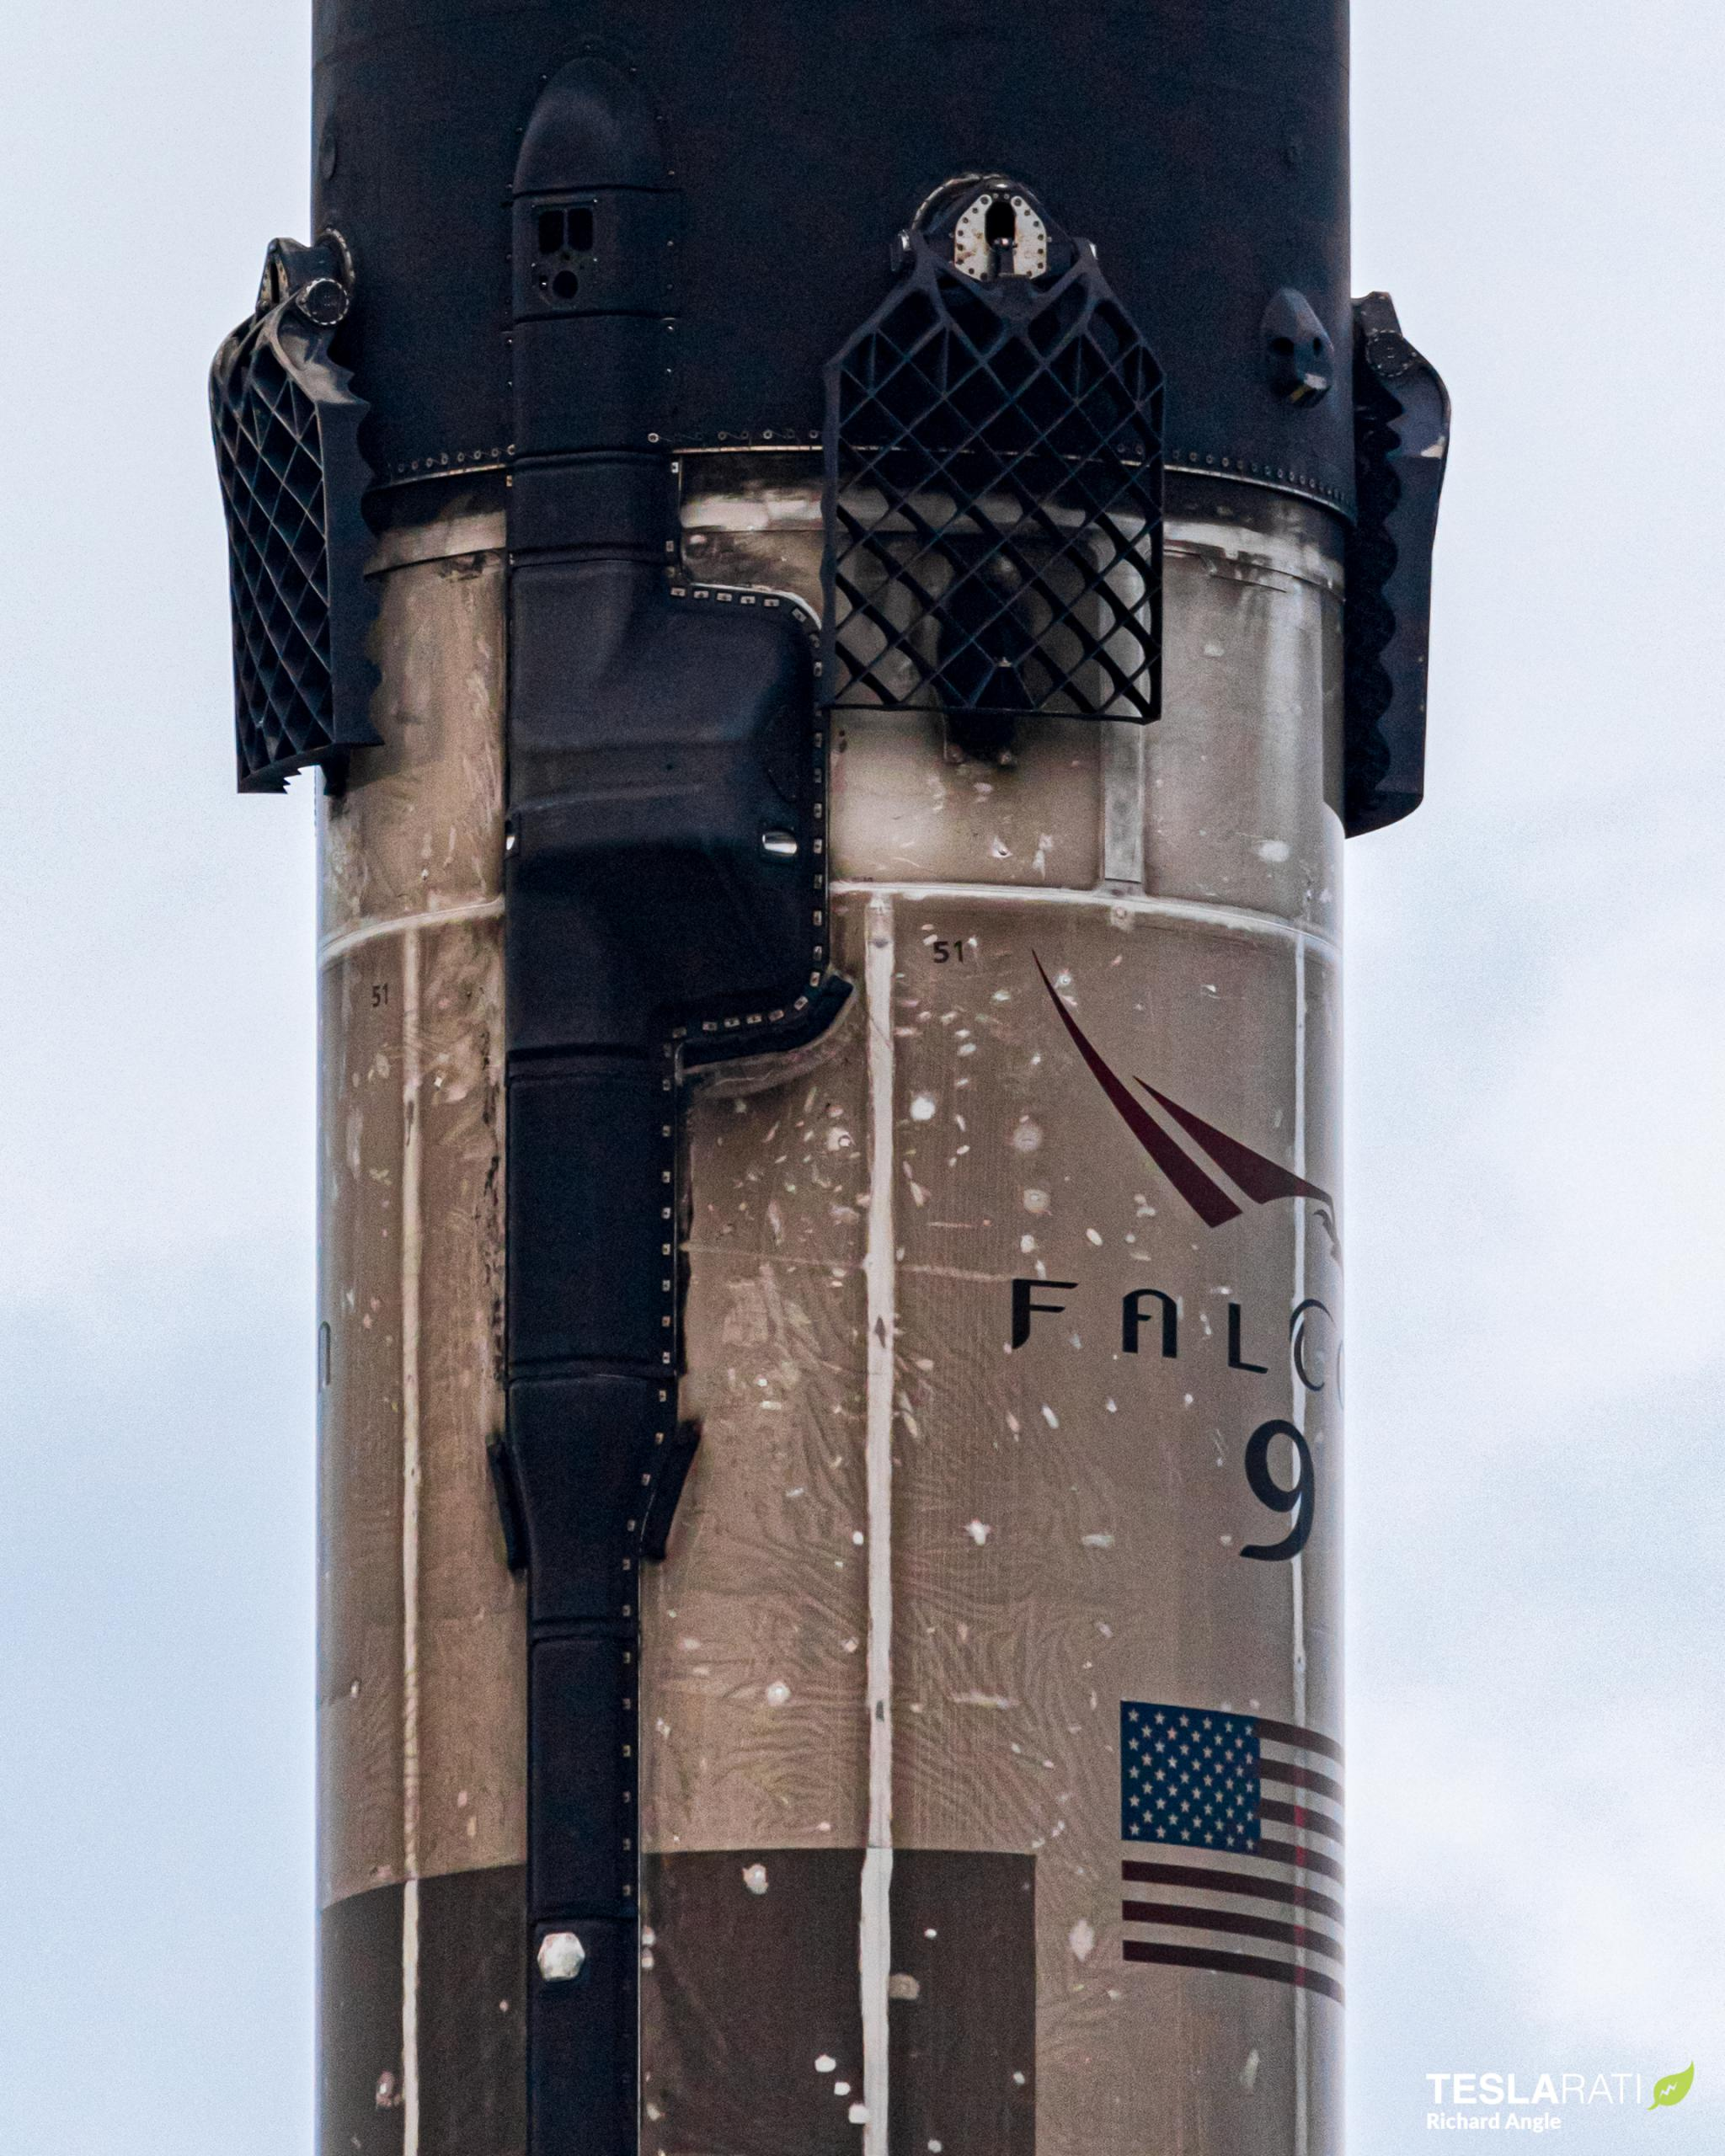 Starlink-13 Falcon 9 B1051 OCISLY return 102120 (Richard Angle) (3) (c)